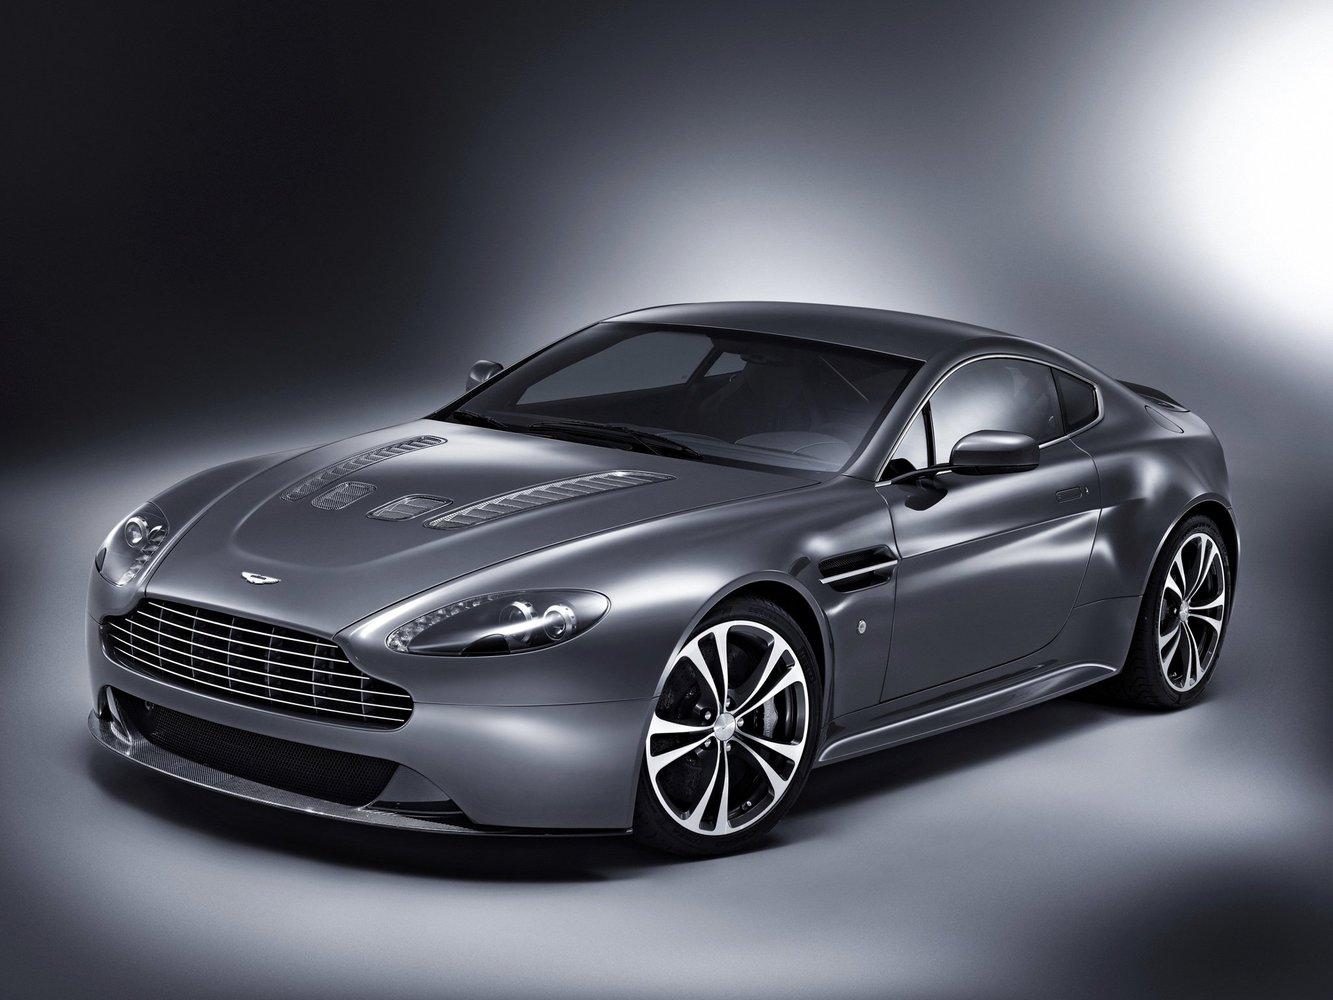 aston_martin Aston Martin V12 Vantage